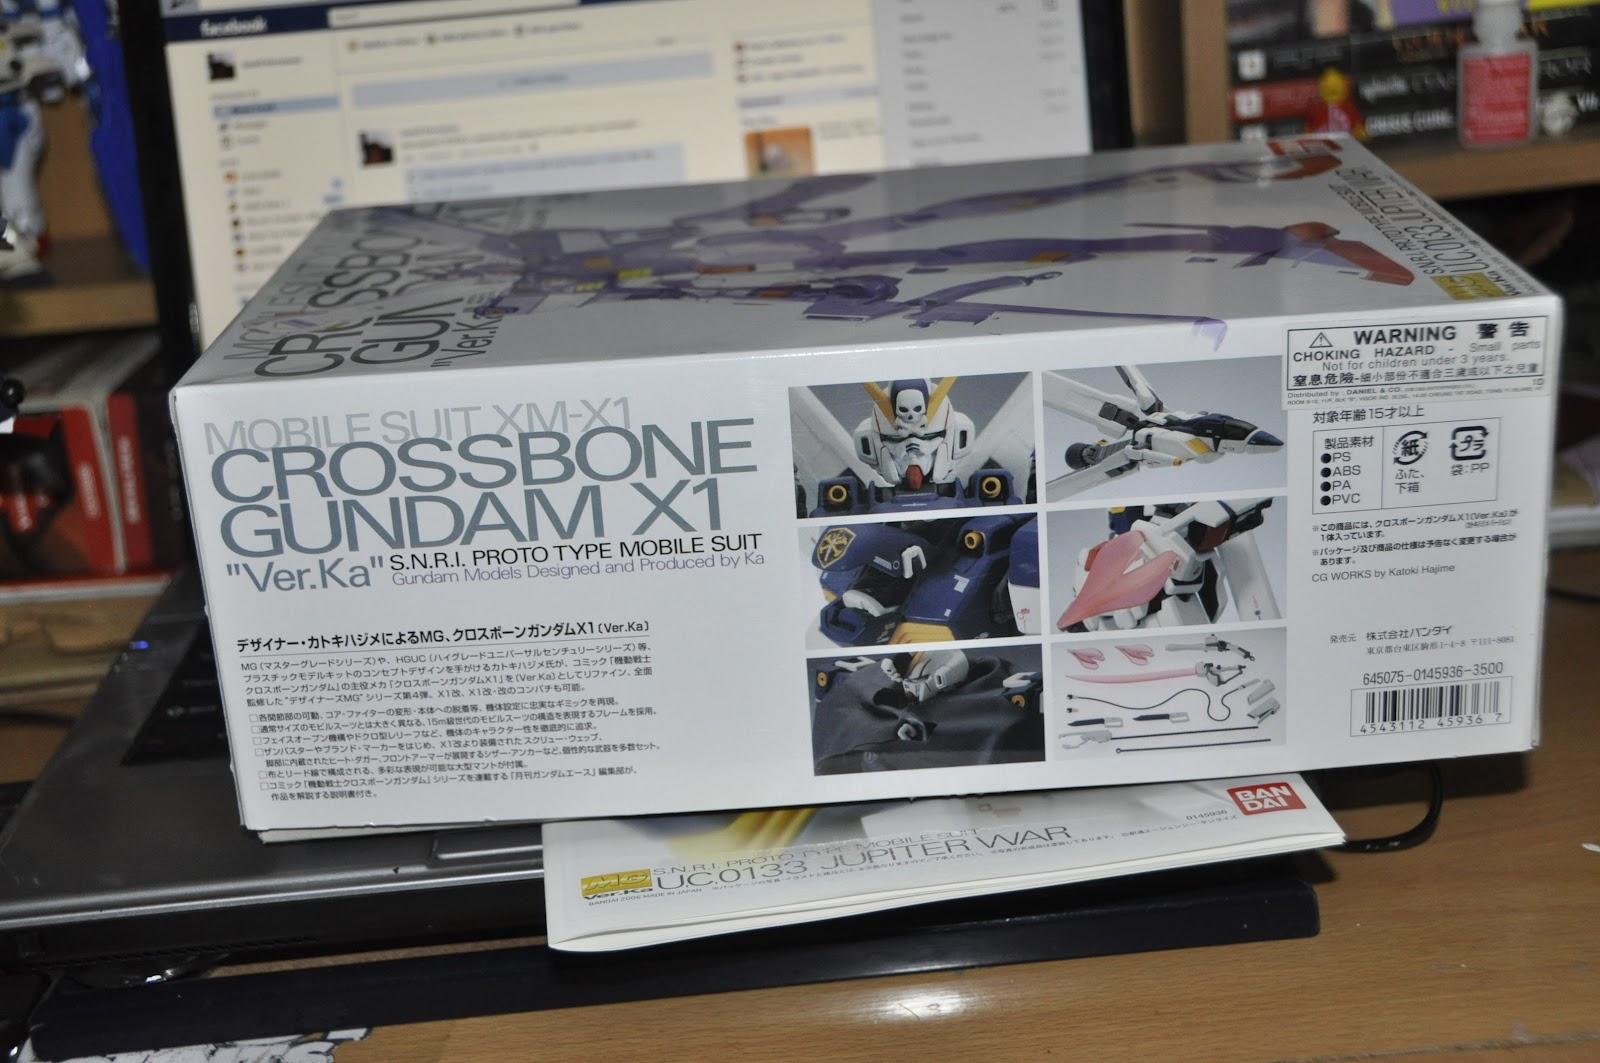 Its An Endless Waltz Gundam Review Mg 1 100 Crossbone X1 Rx78 2 Verka 114215 Other Side Of The Box